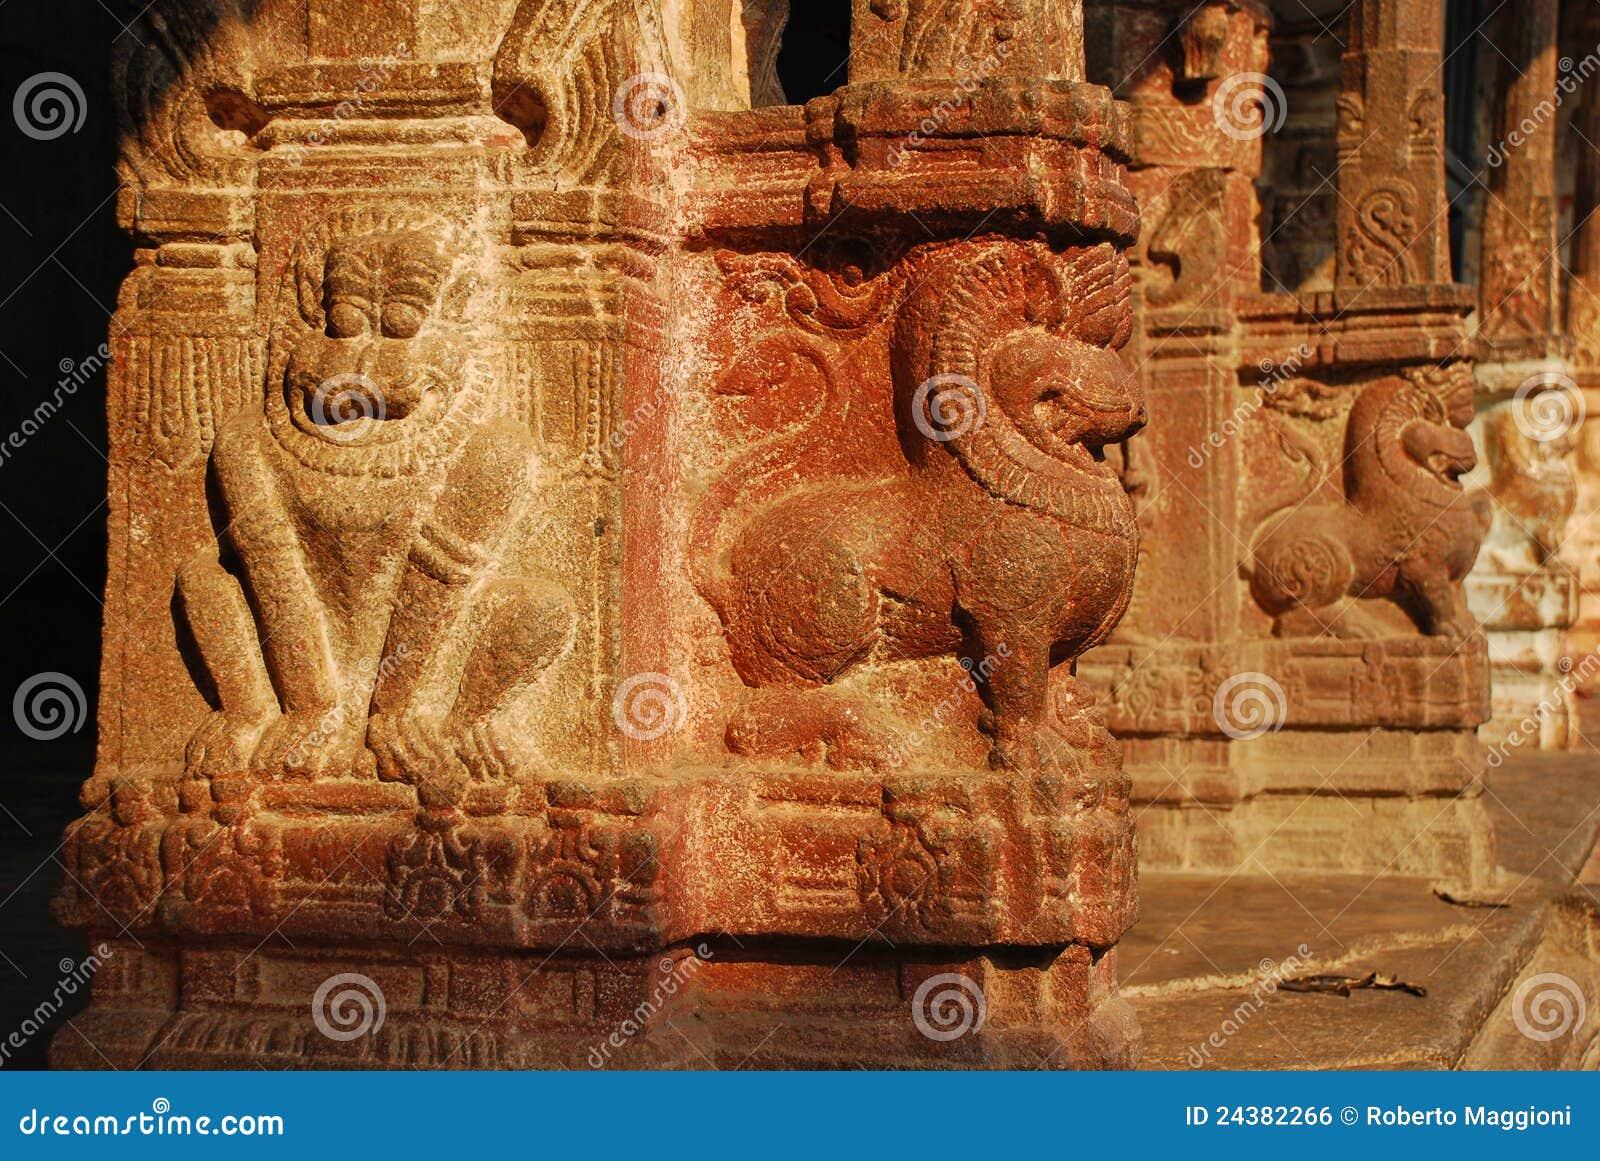 Viripaksha temple hampi stone carvings royalty free